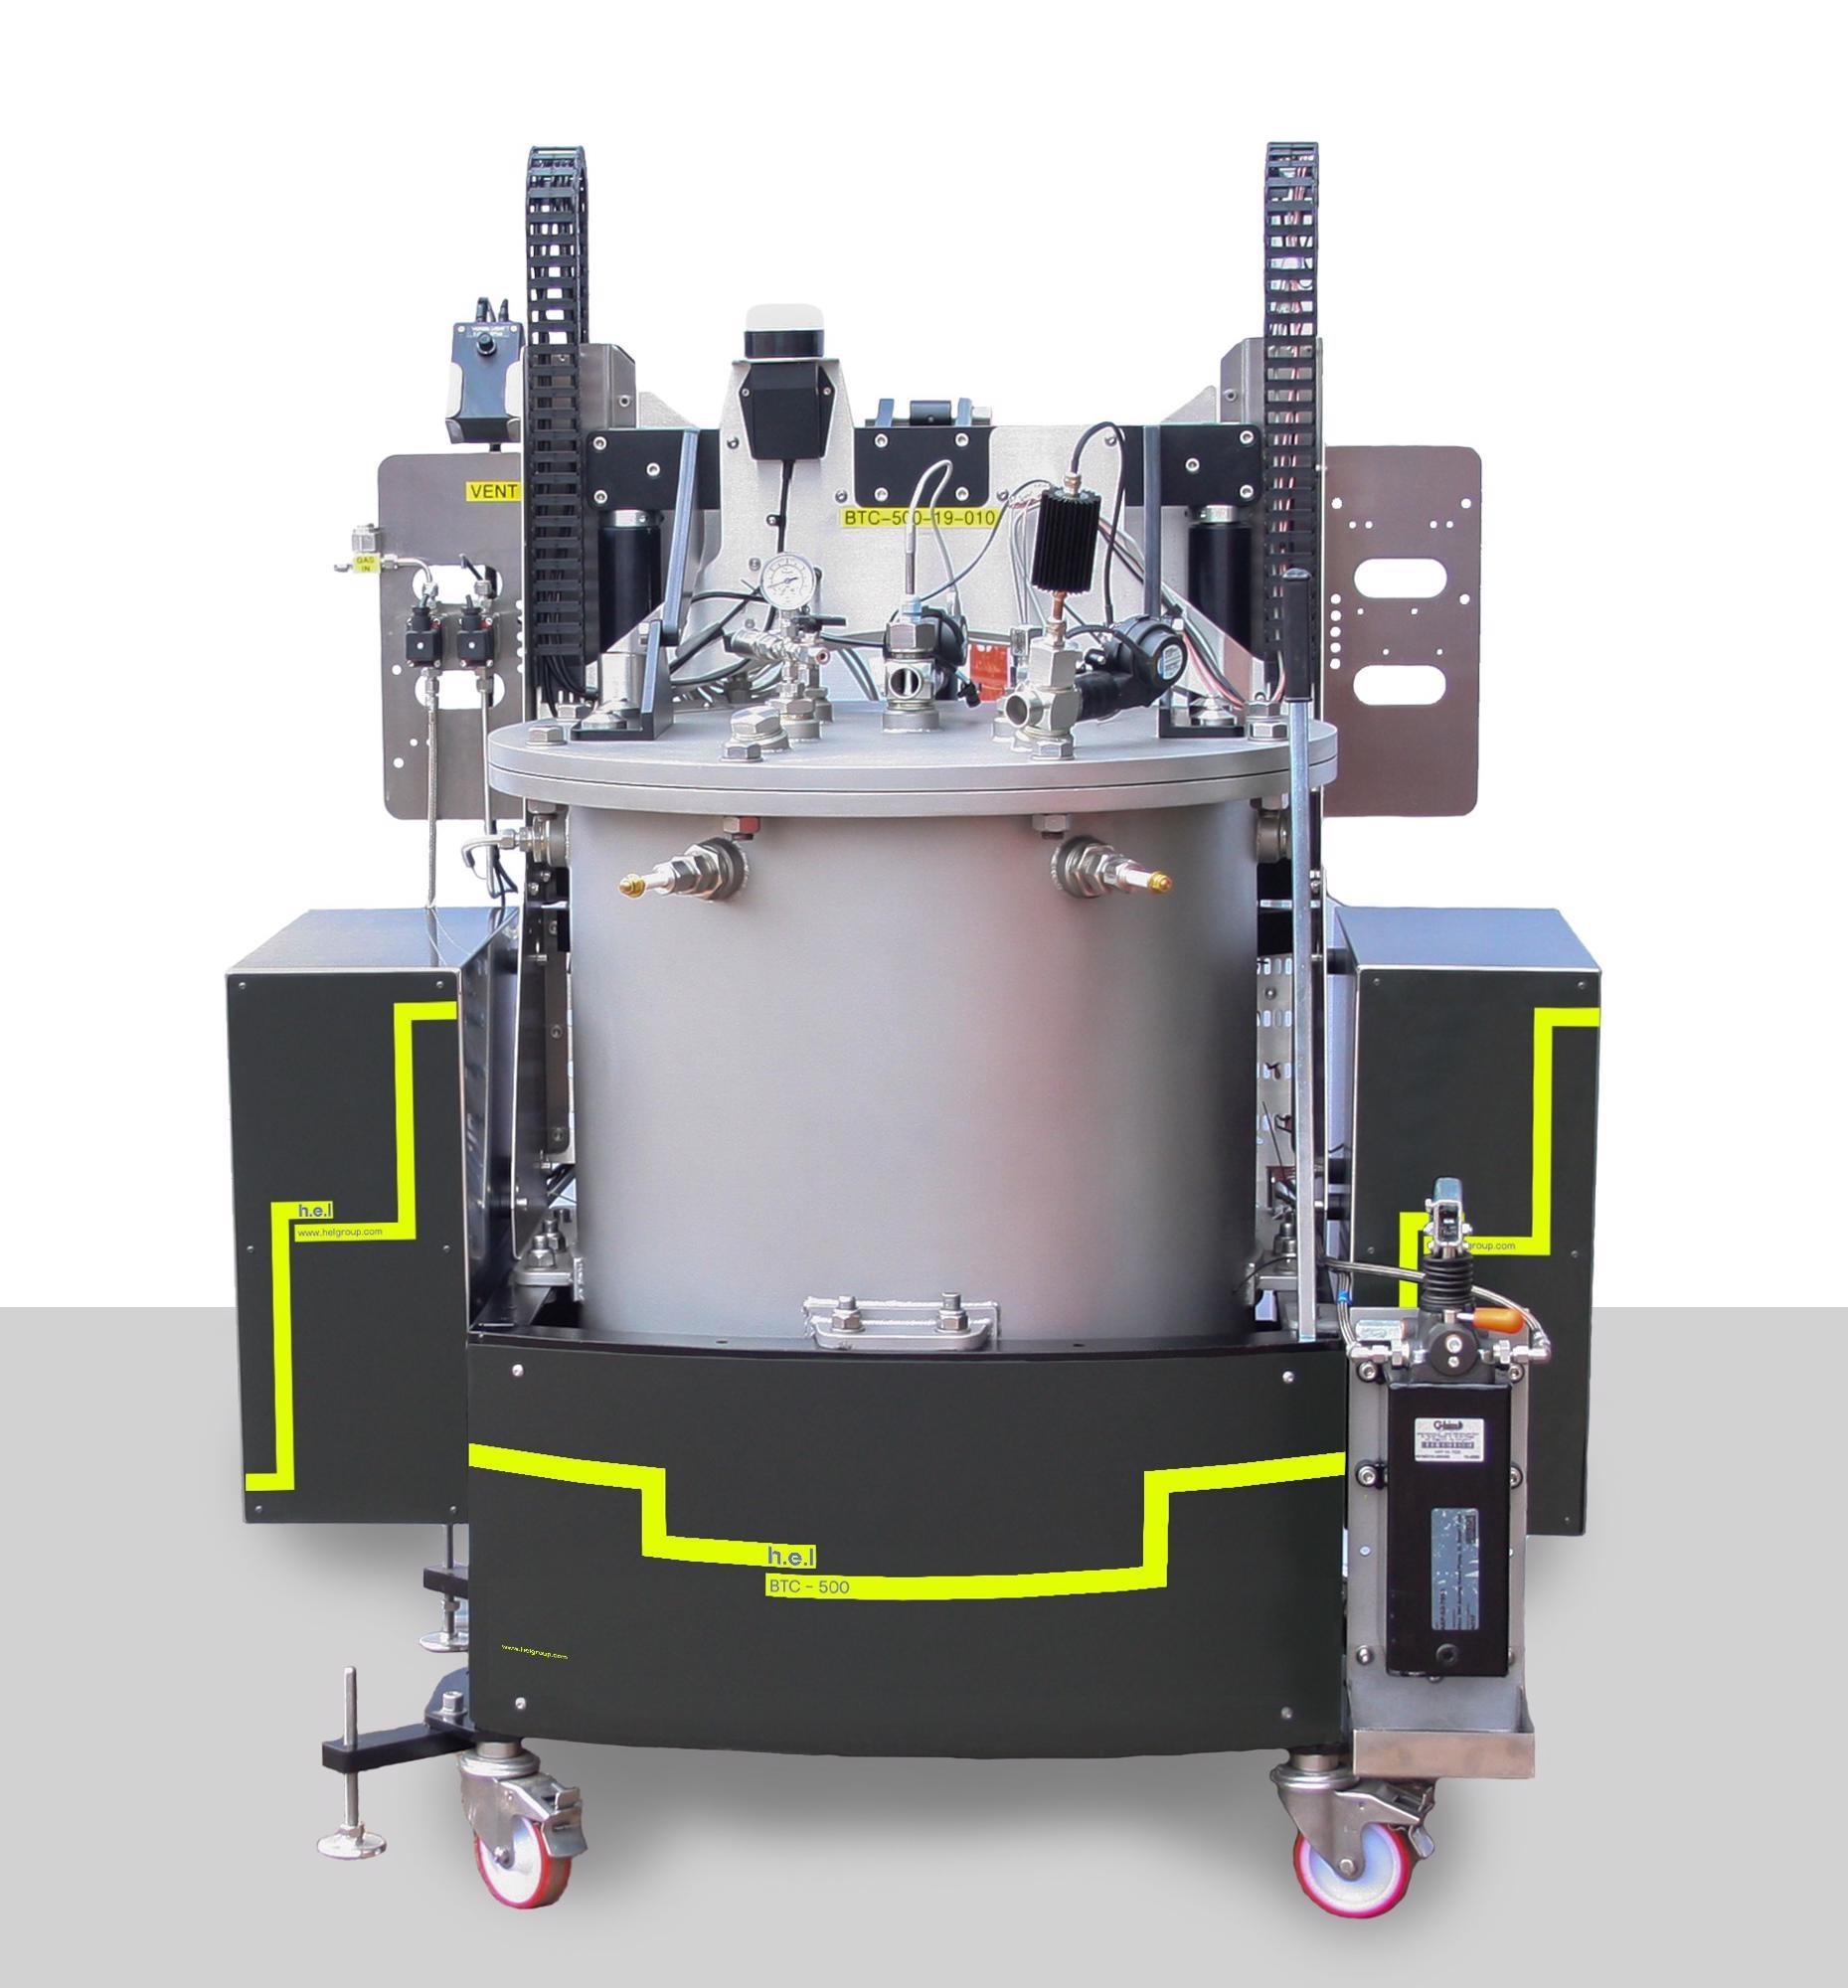 BTC-500: A Floor Standing, Battery Safety Testing, Adiabatic Calorimeter